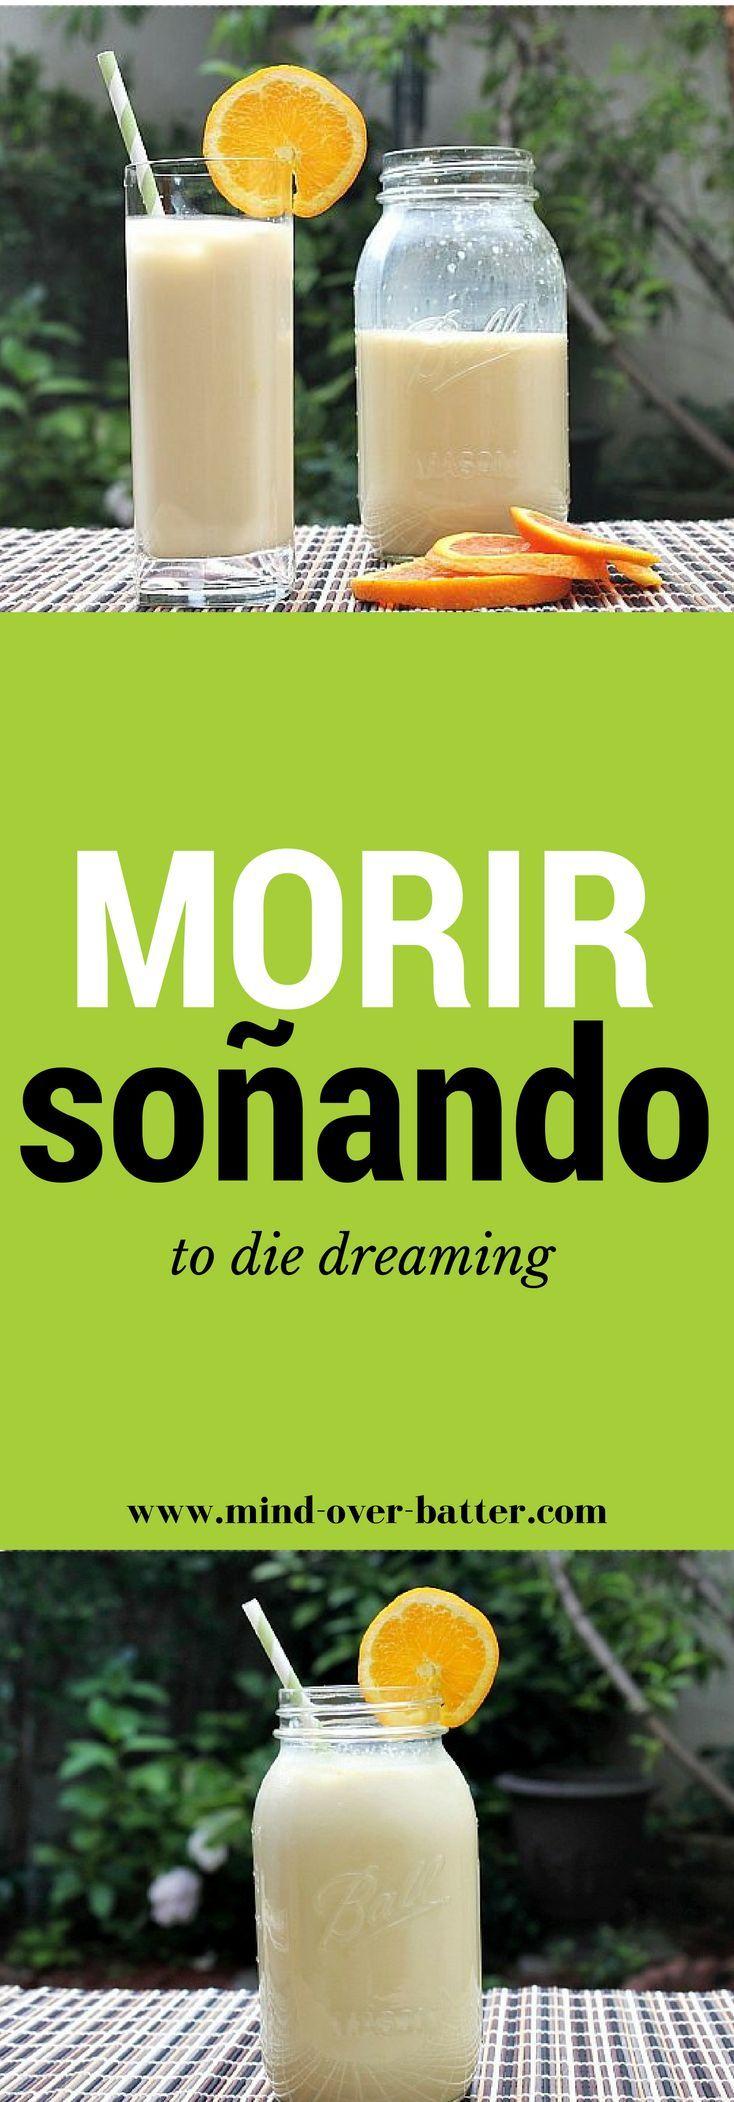 Morir Soñando - The Latino Creamsicle! http://www.mind-over-batter.com